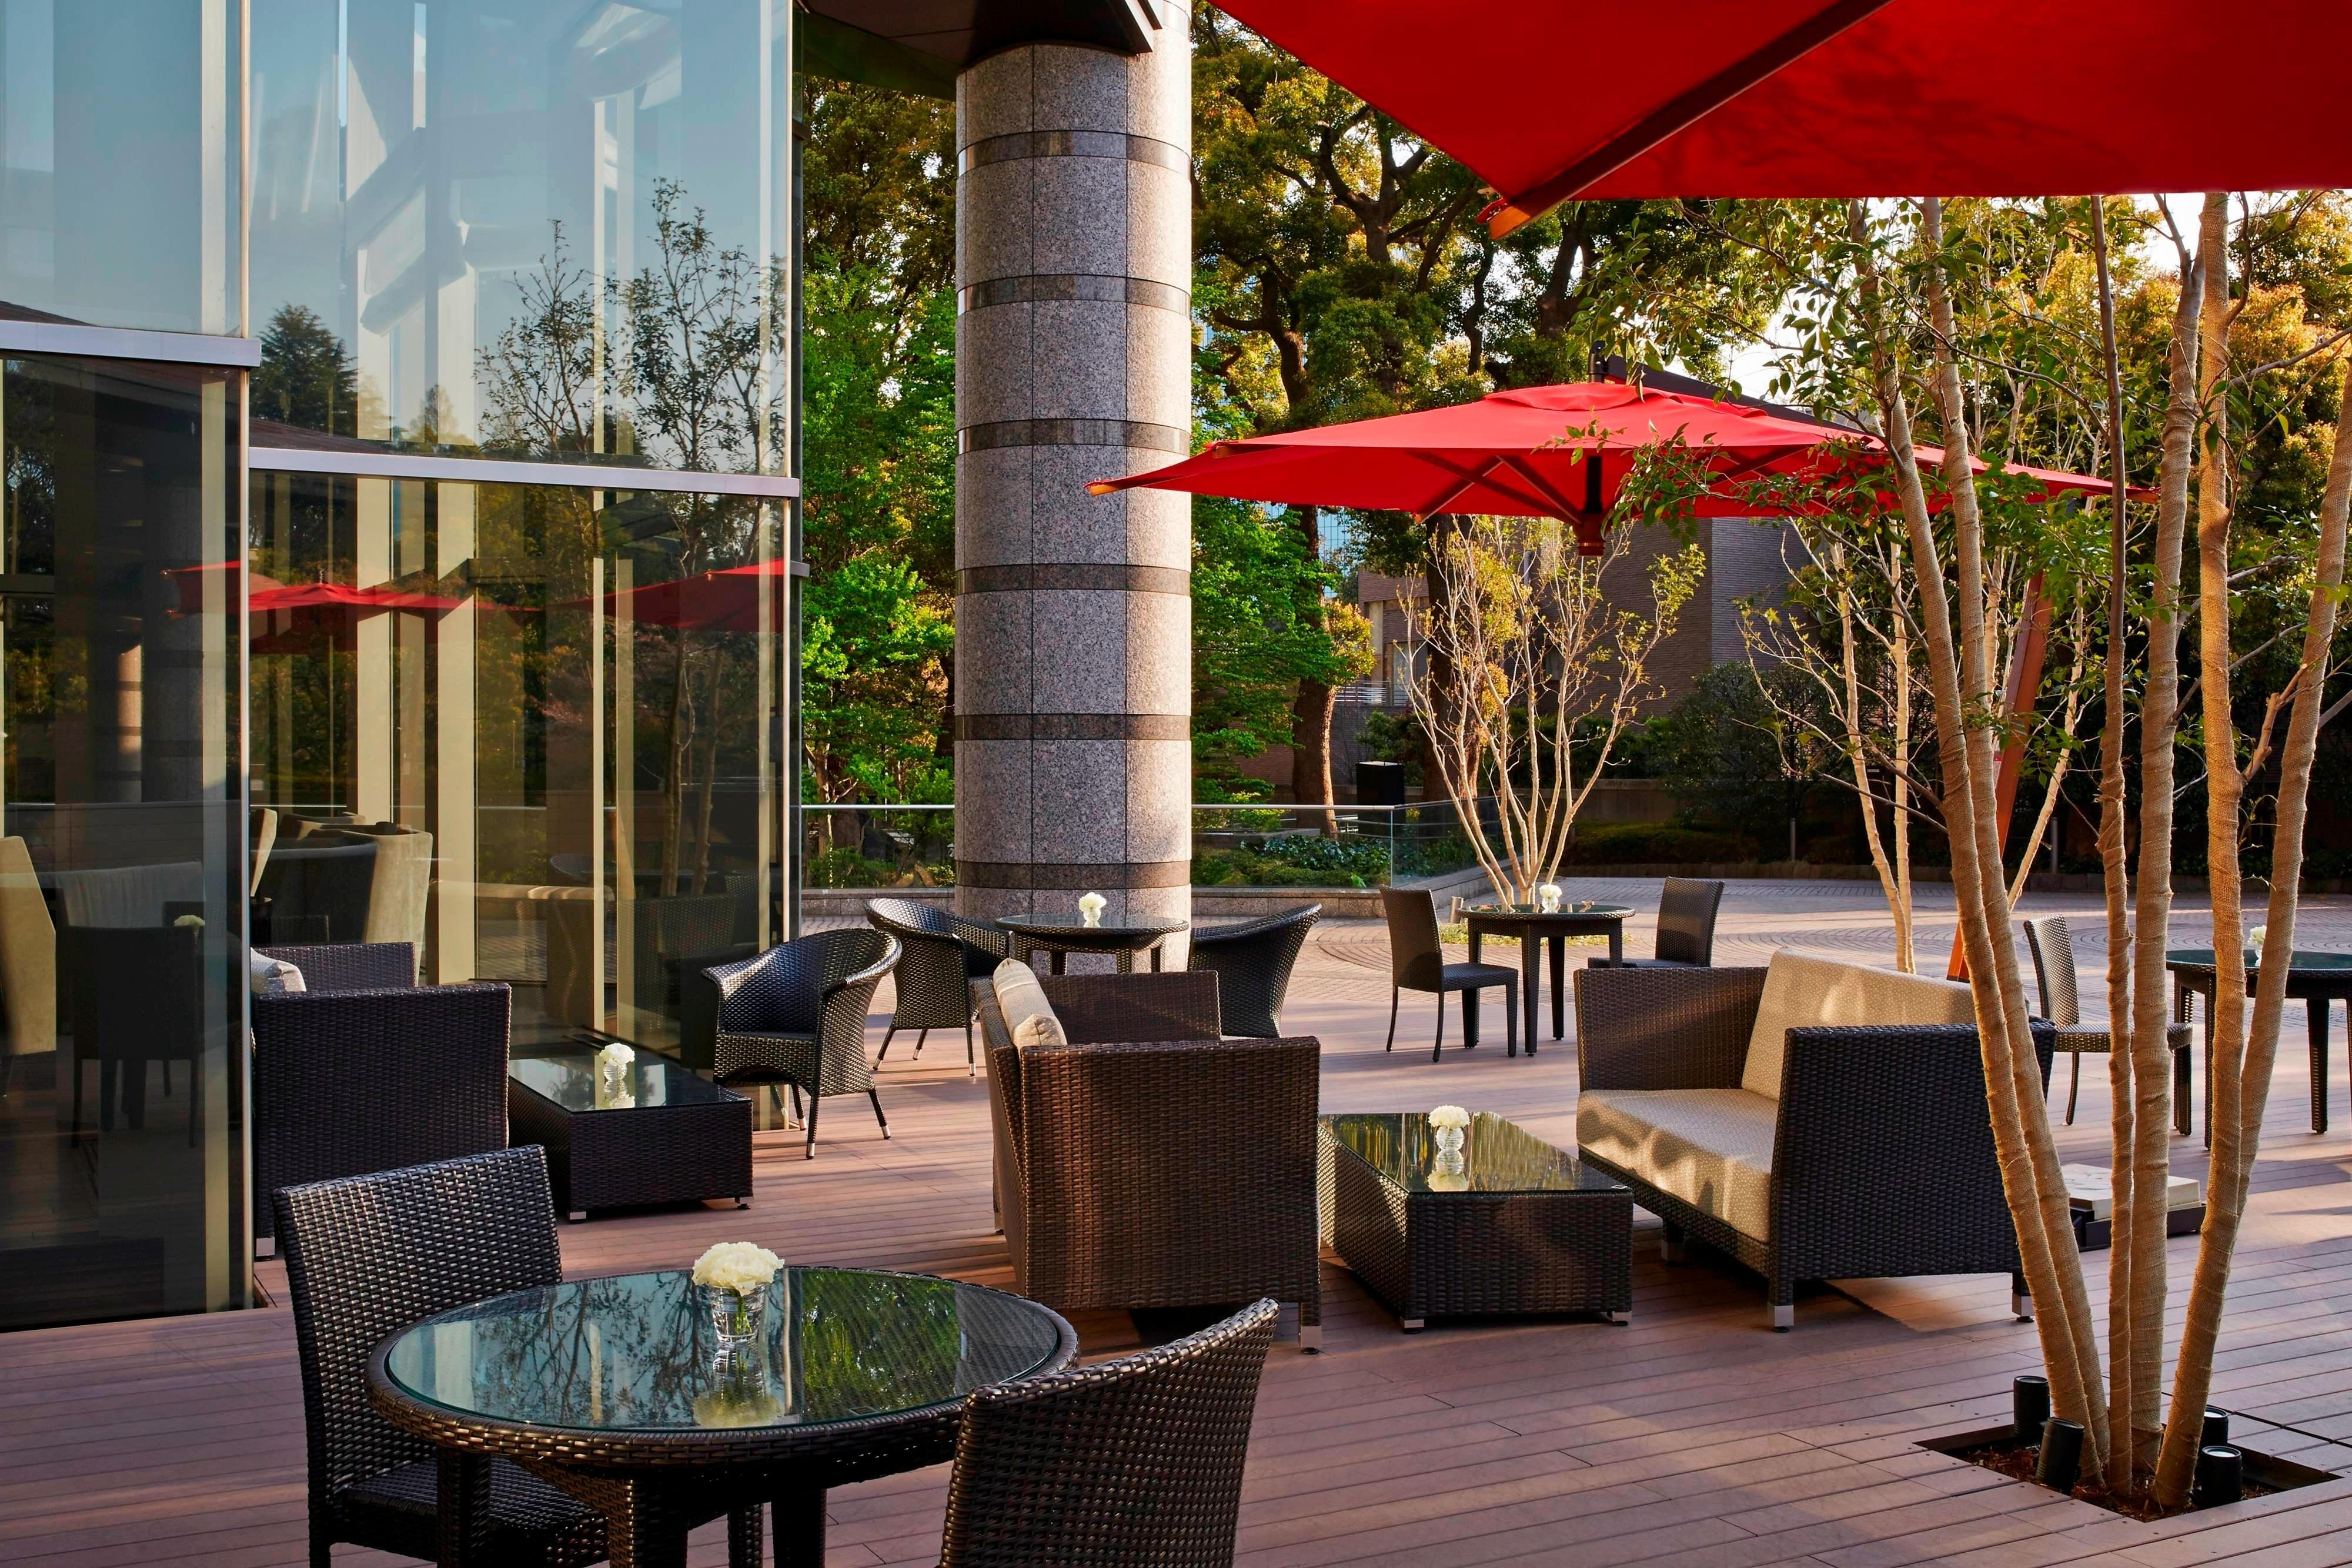 Tokyo Marriott Hotel Lounge & Dining G